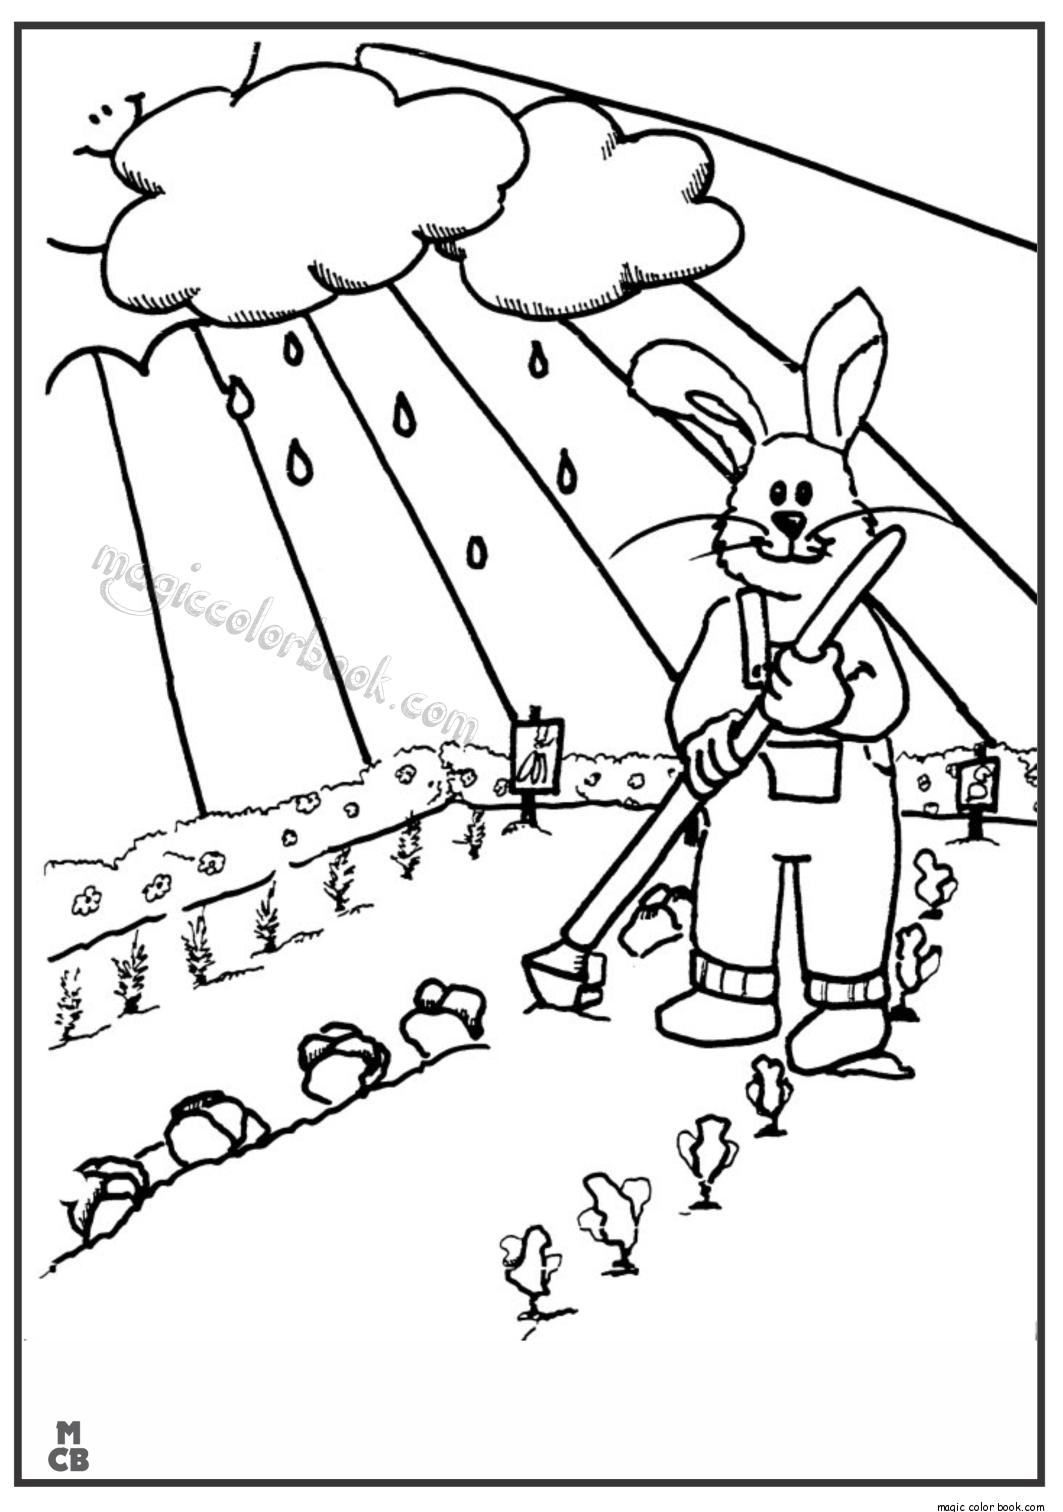 Free online coloring cartoons - Free Onlinecoloringcartoon